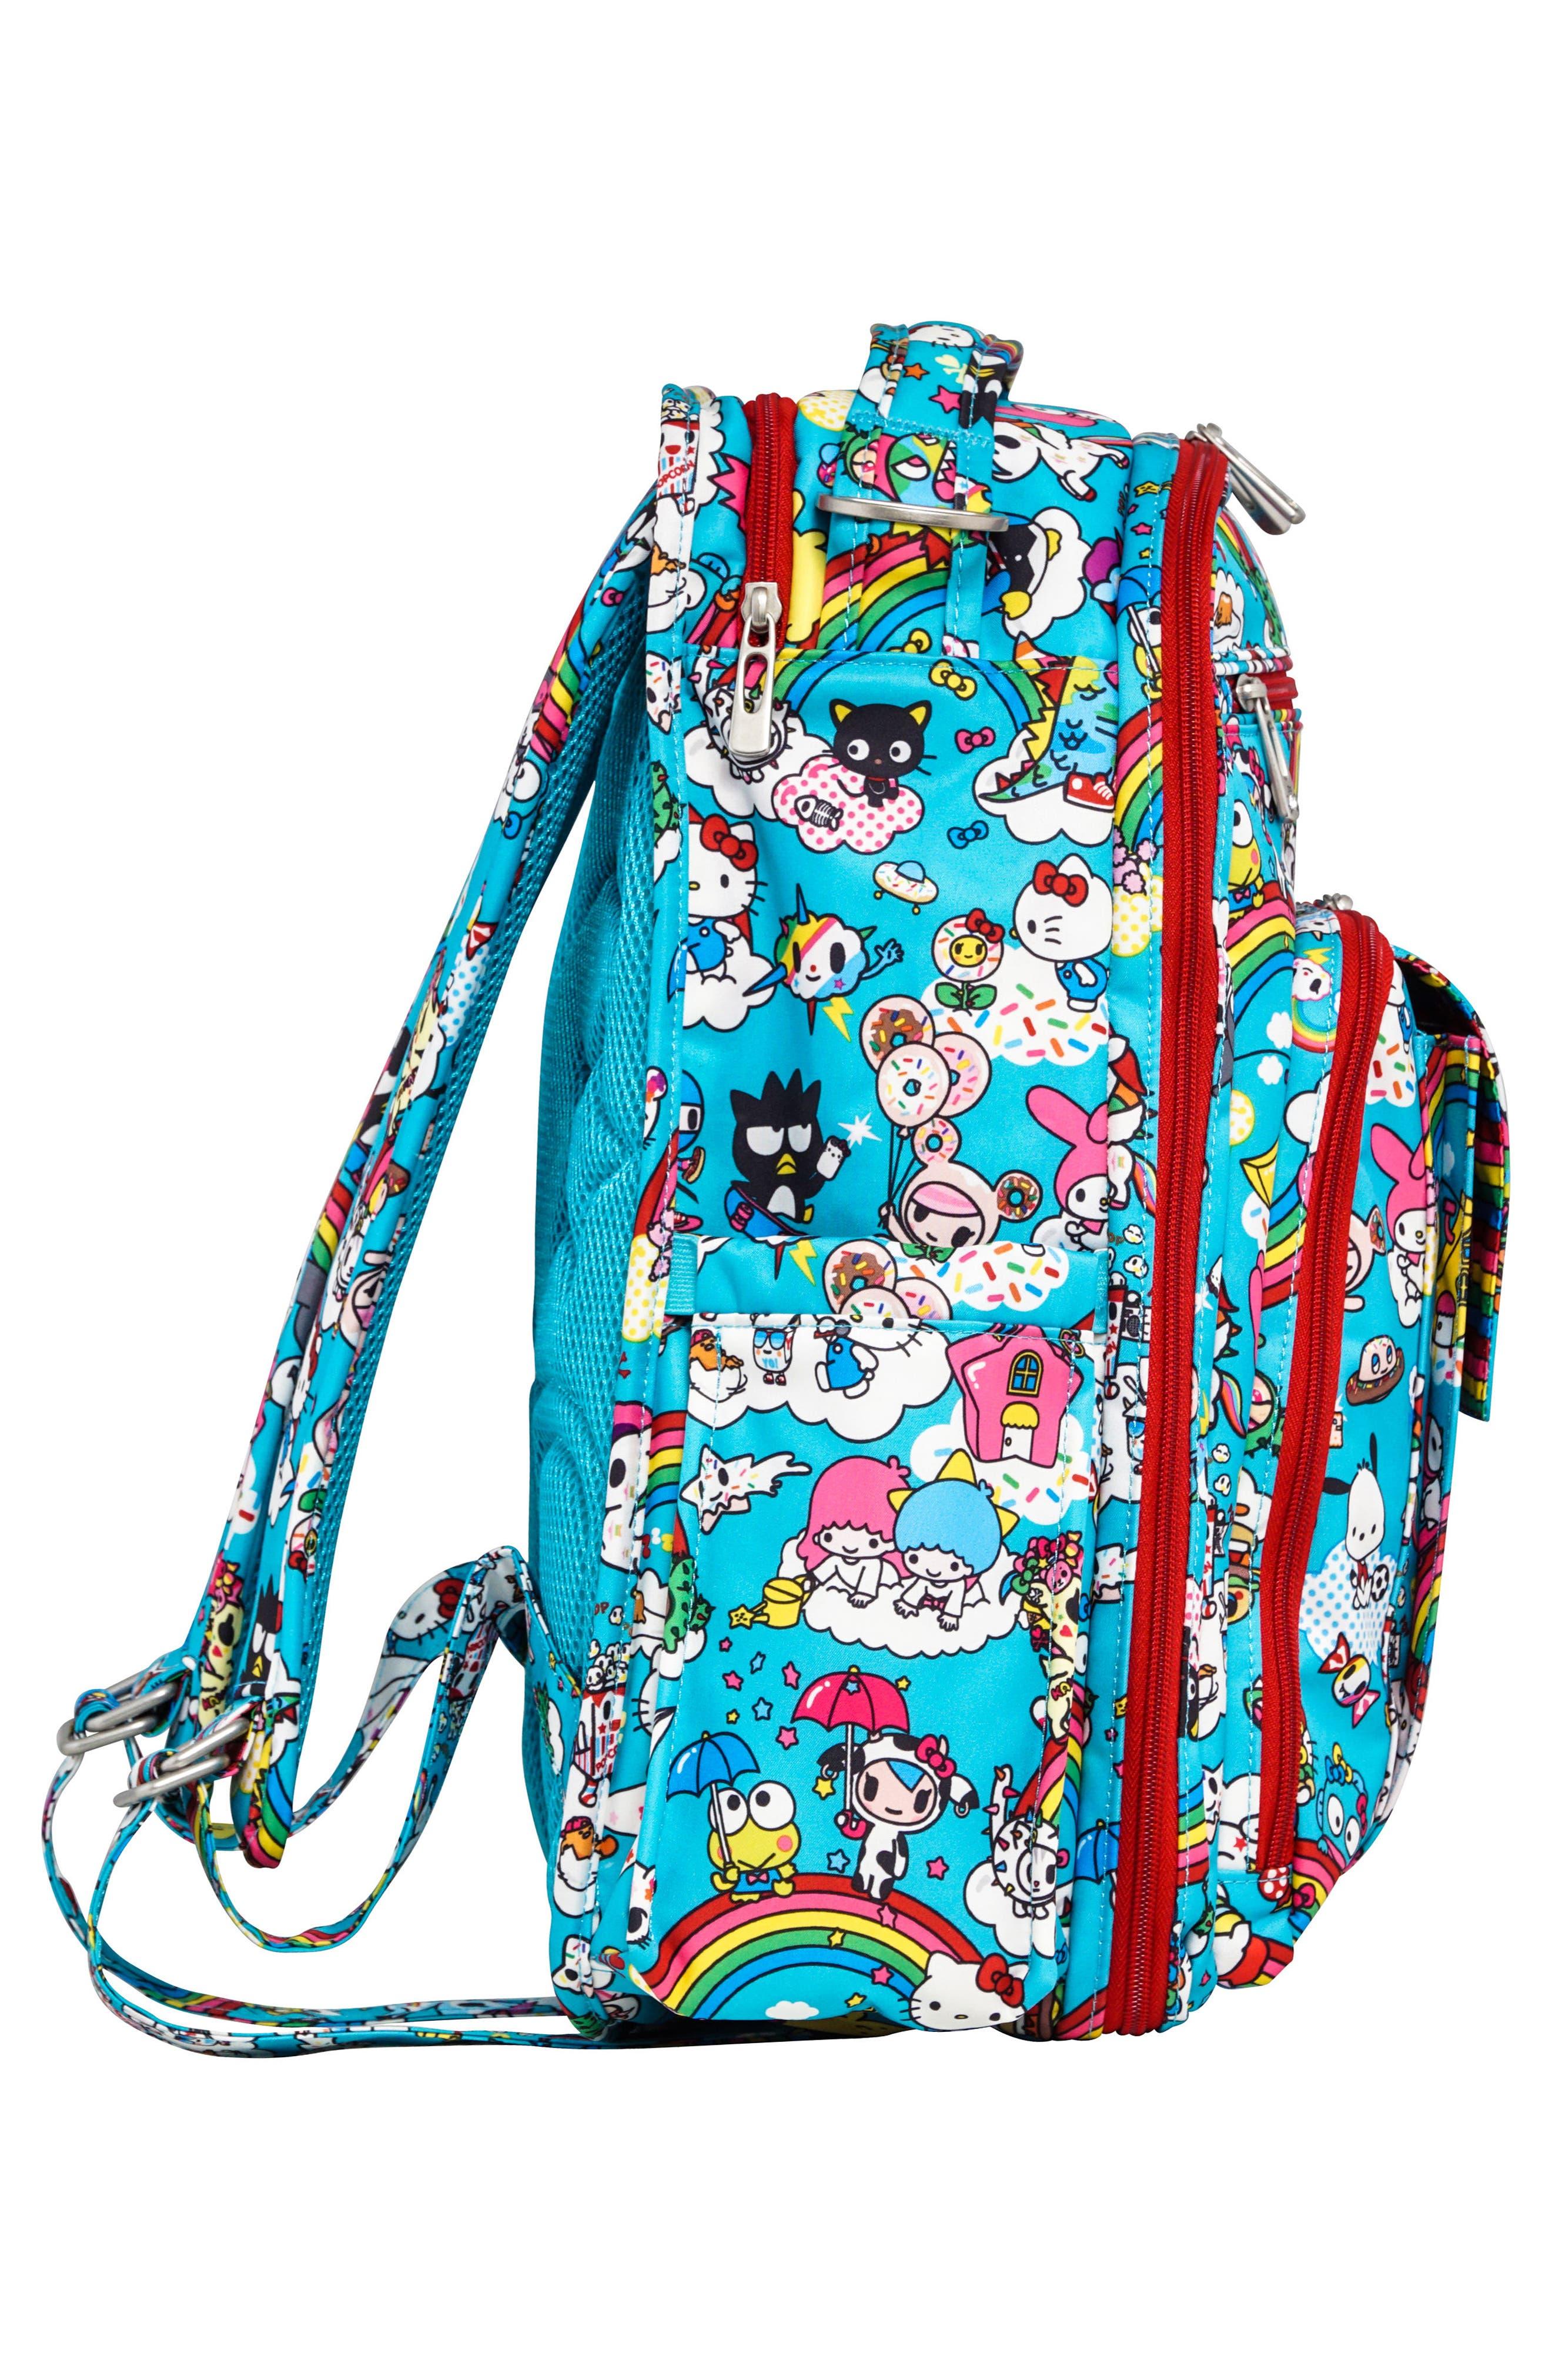 x tokidoki for Hello Sanrio Rainbow Dreams Be Mini Backpack,                             Alternate thumbnail 3, color,                             433